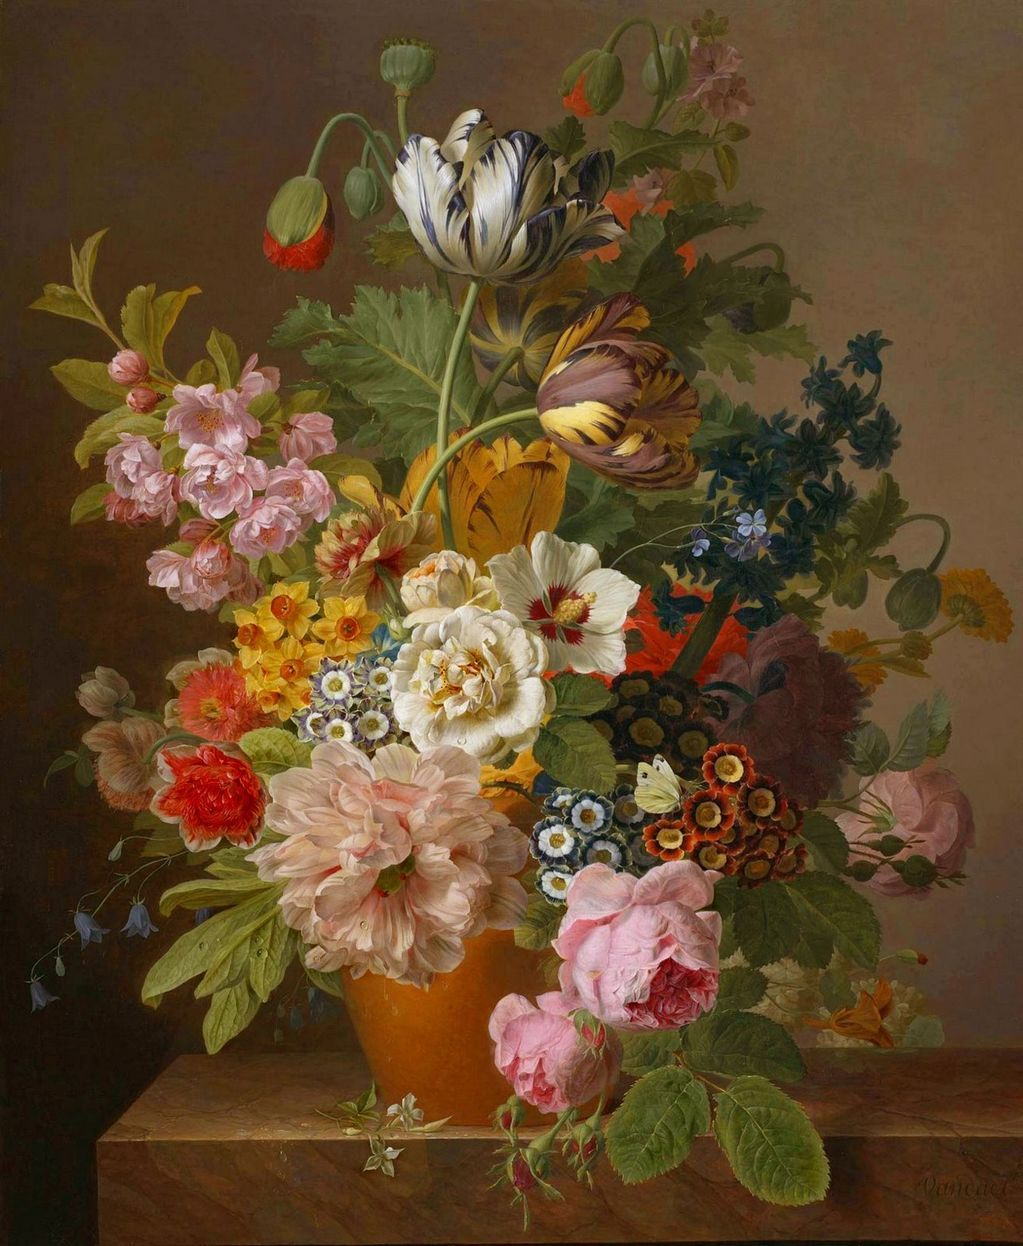 Jan Frans Van Dael (1764-1840) Bouquet | живопись | Pinterest | Vans ...